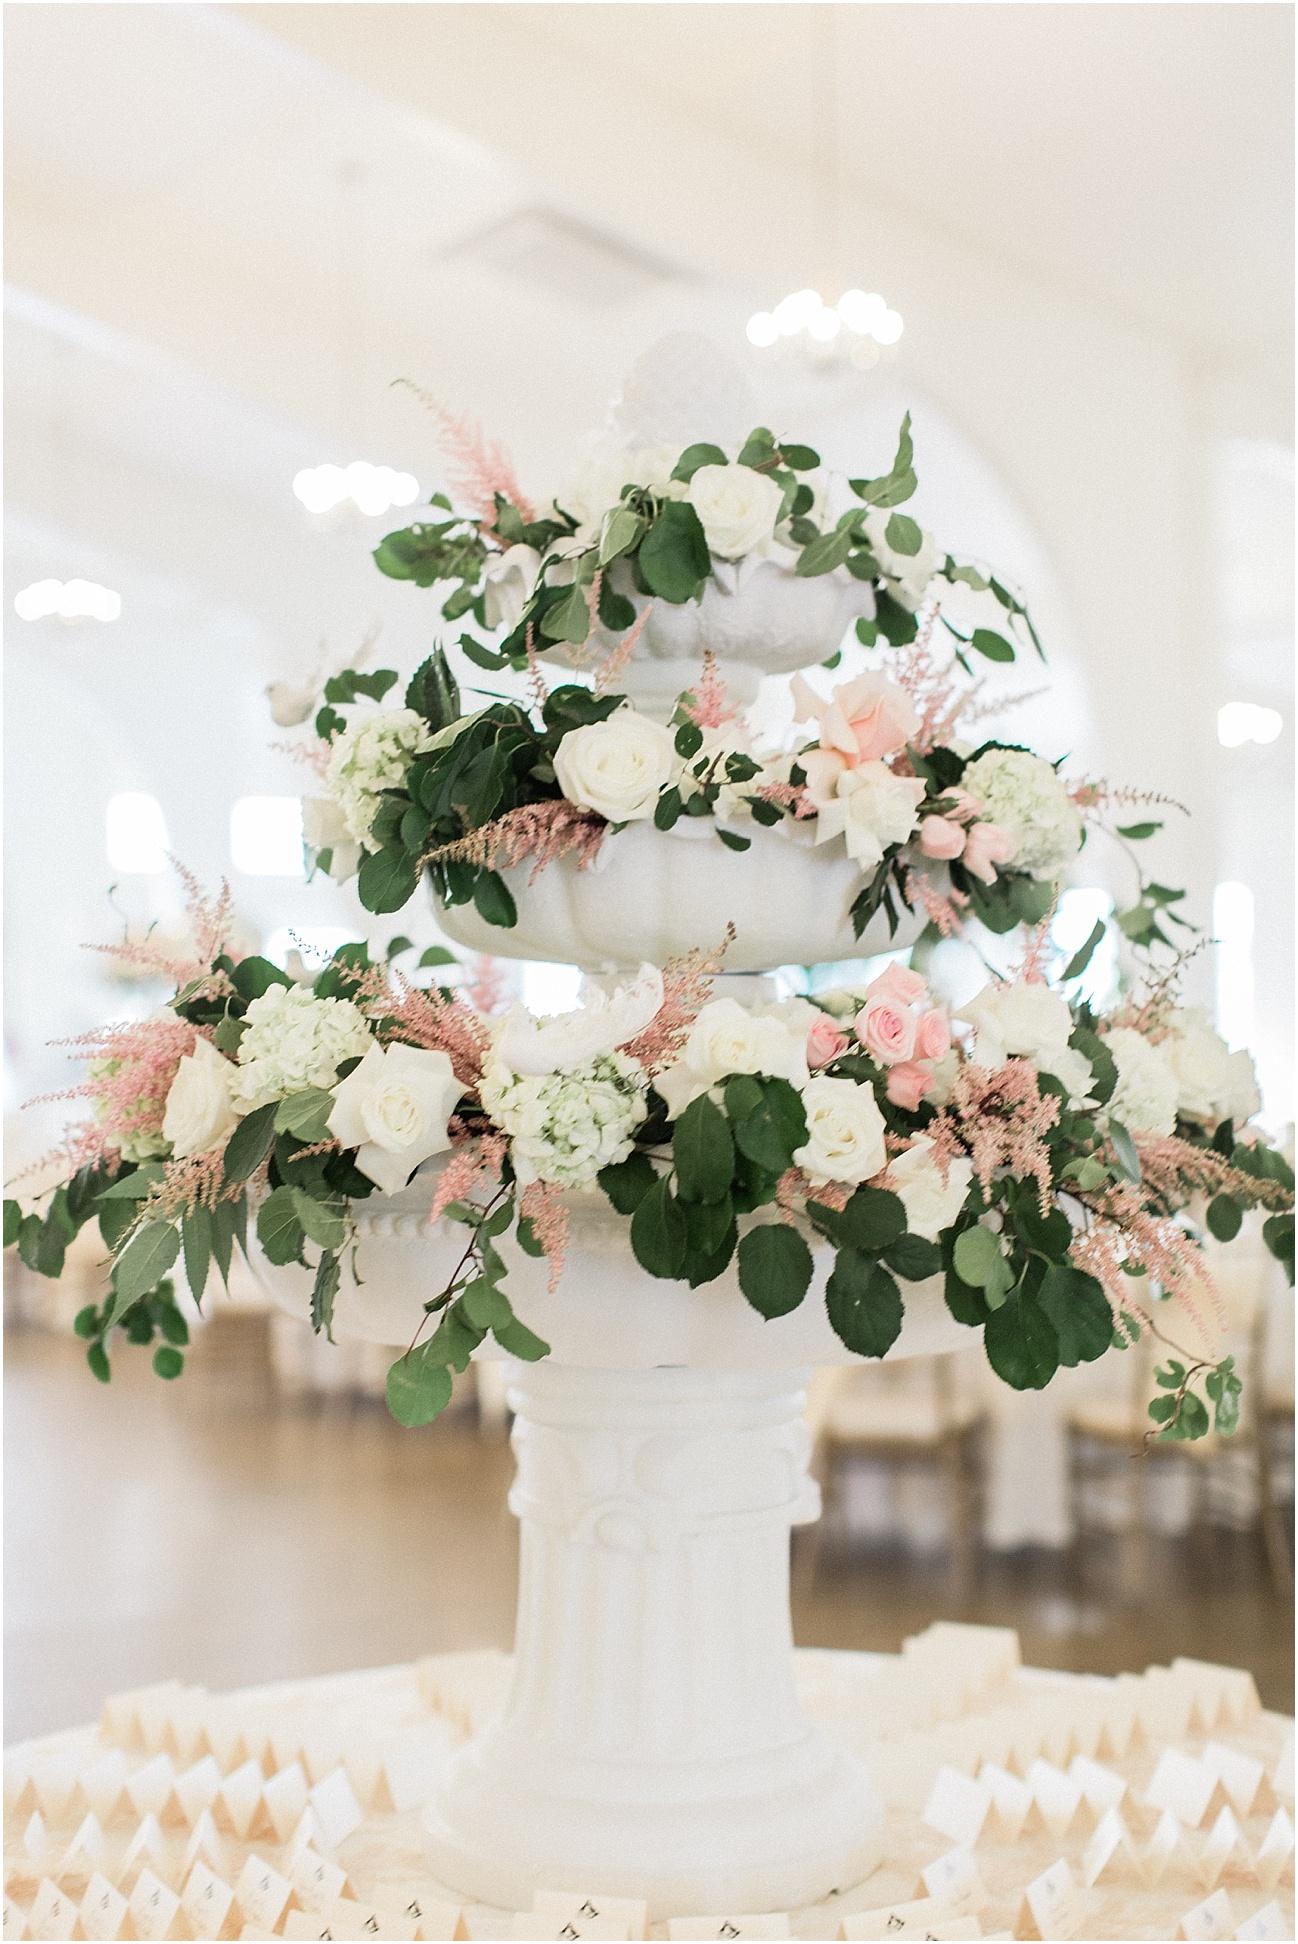 bianca_chris_danversport_italian_blush_gold_north_shore_cape_cod_boston_wedding_photographer_meredith_jane_photography_photo_1146.jpg